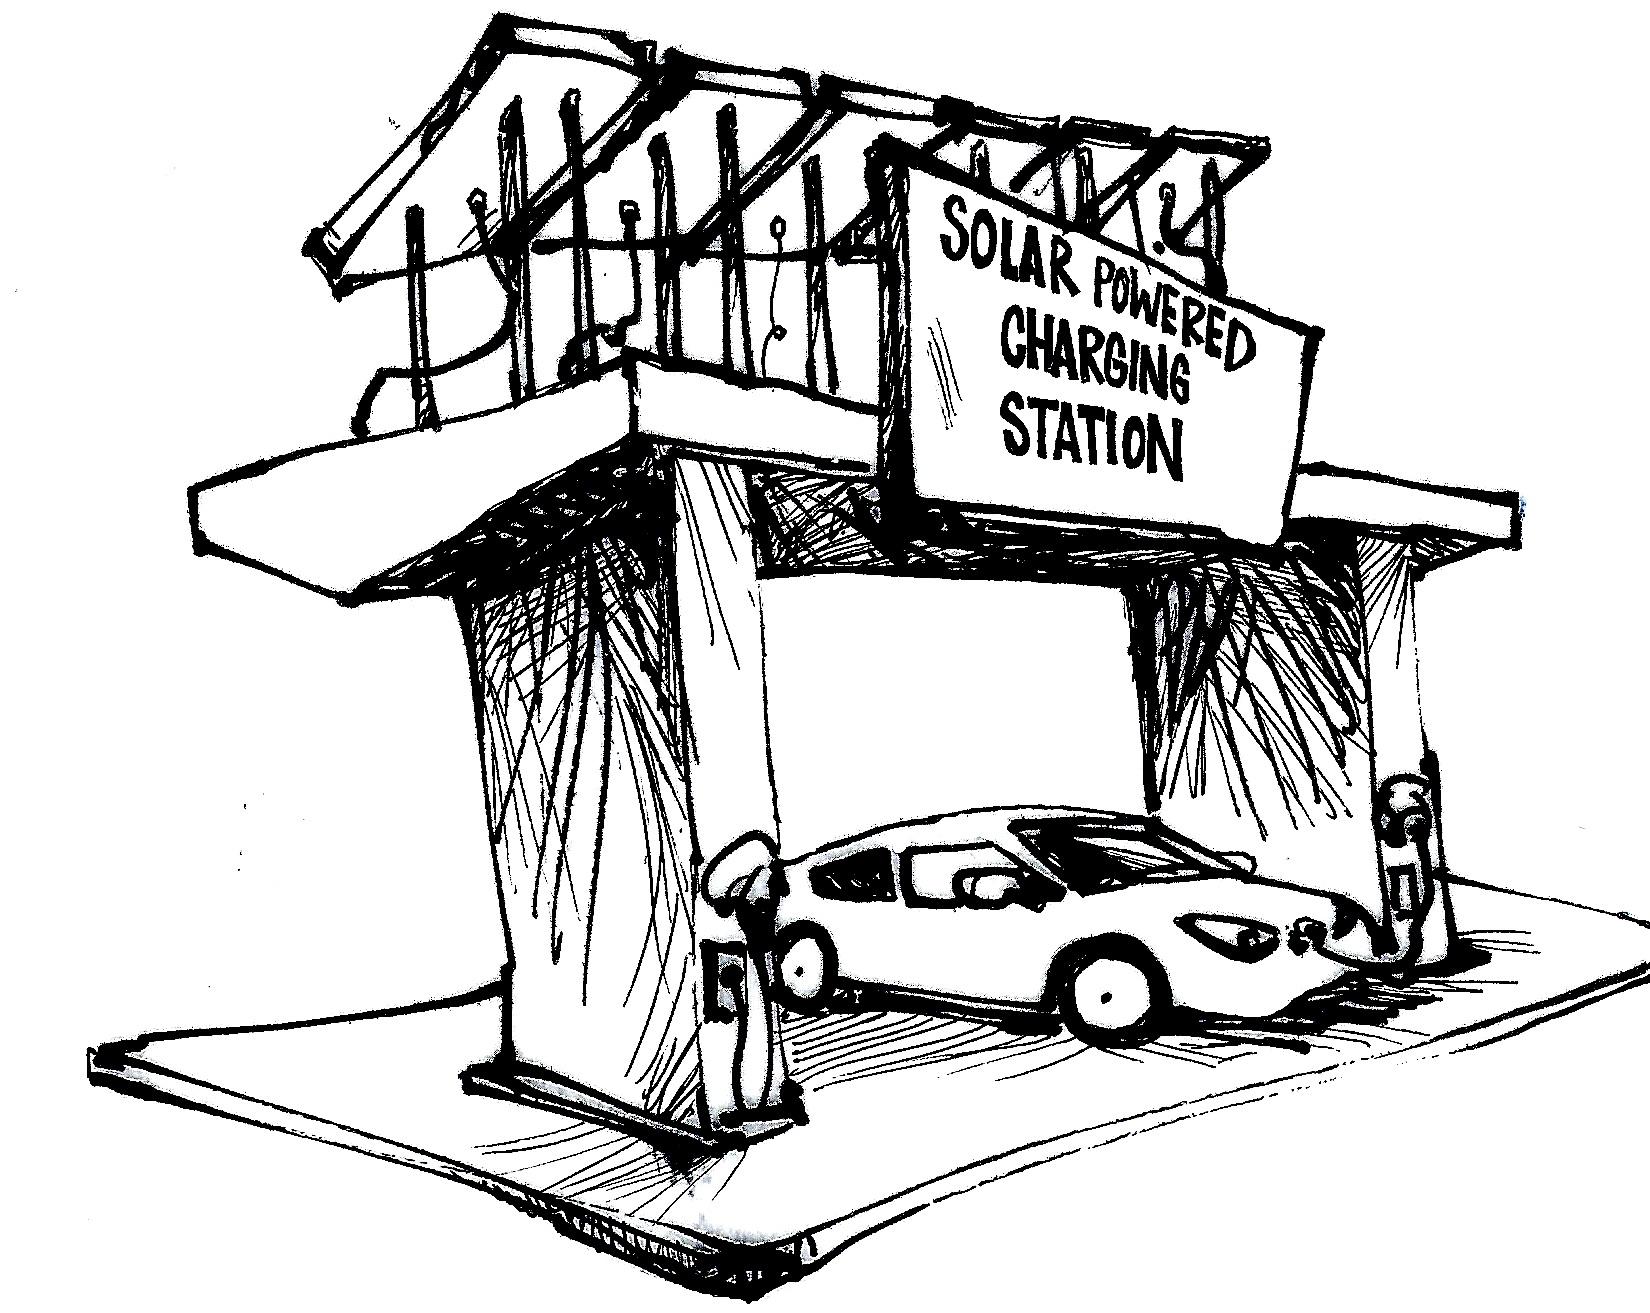 Handy:Charging Station